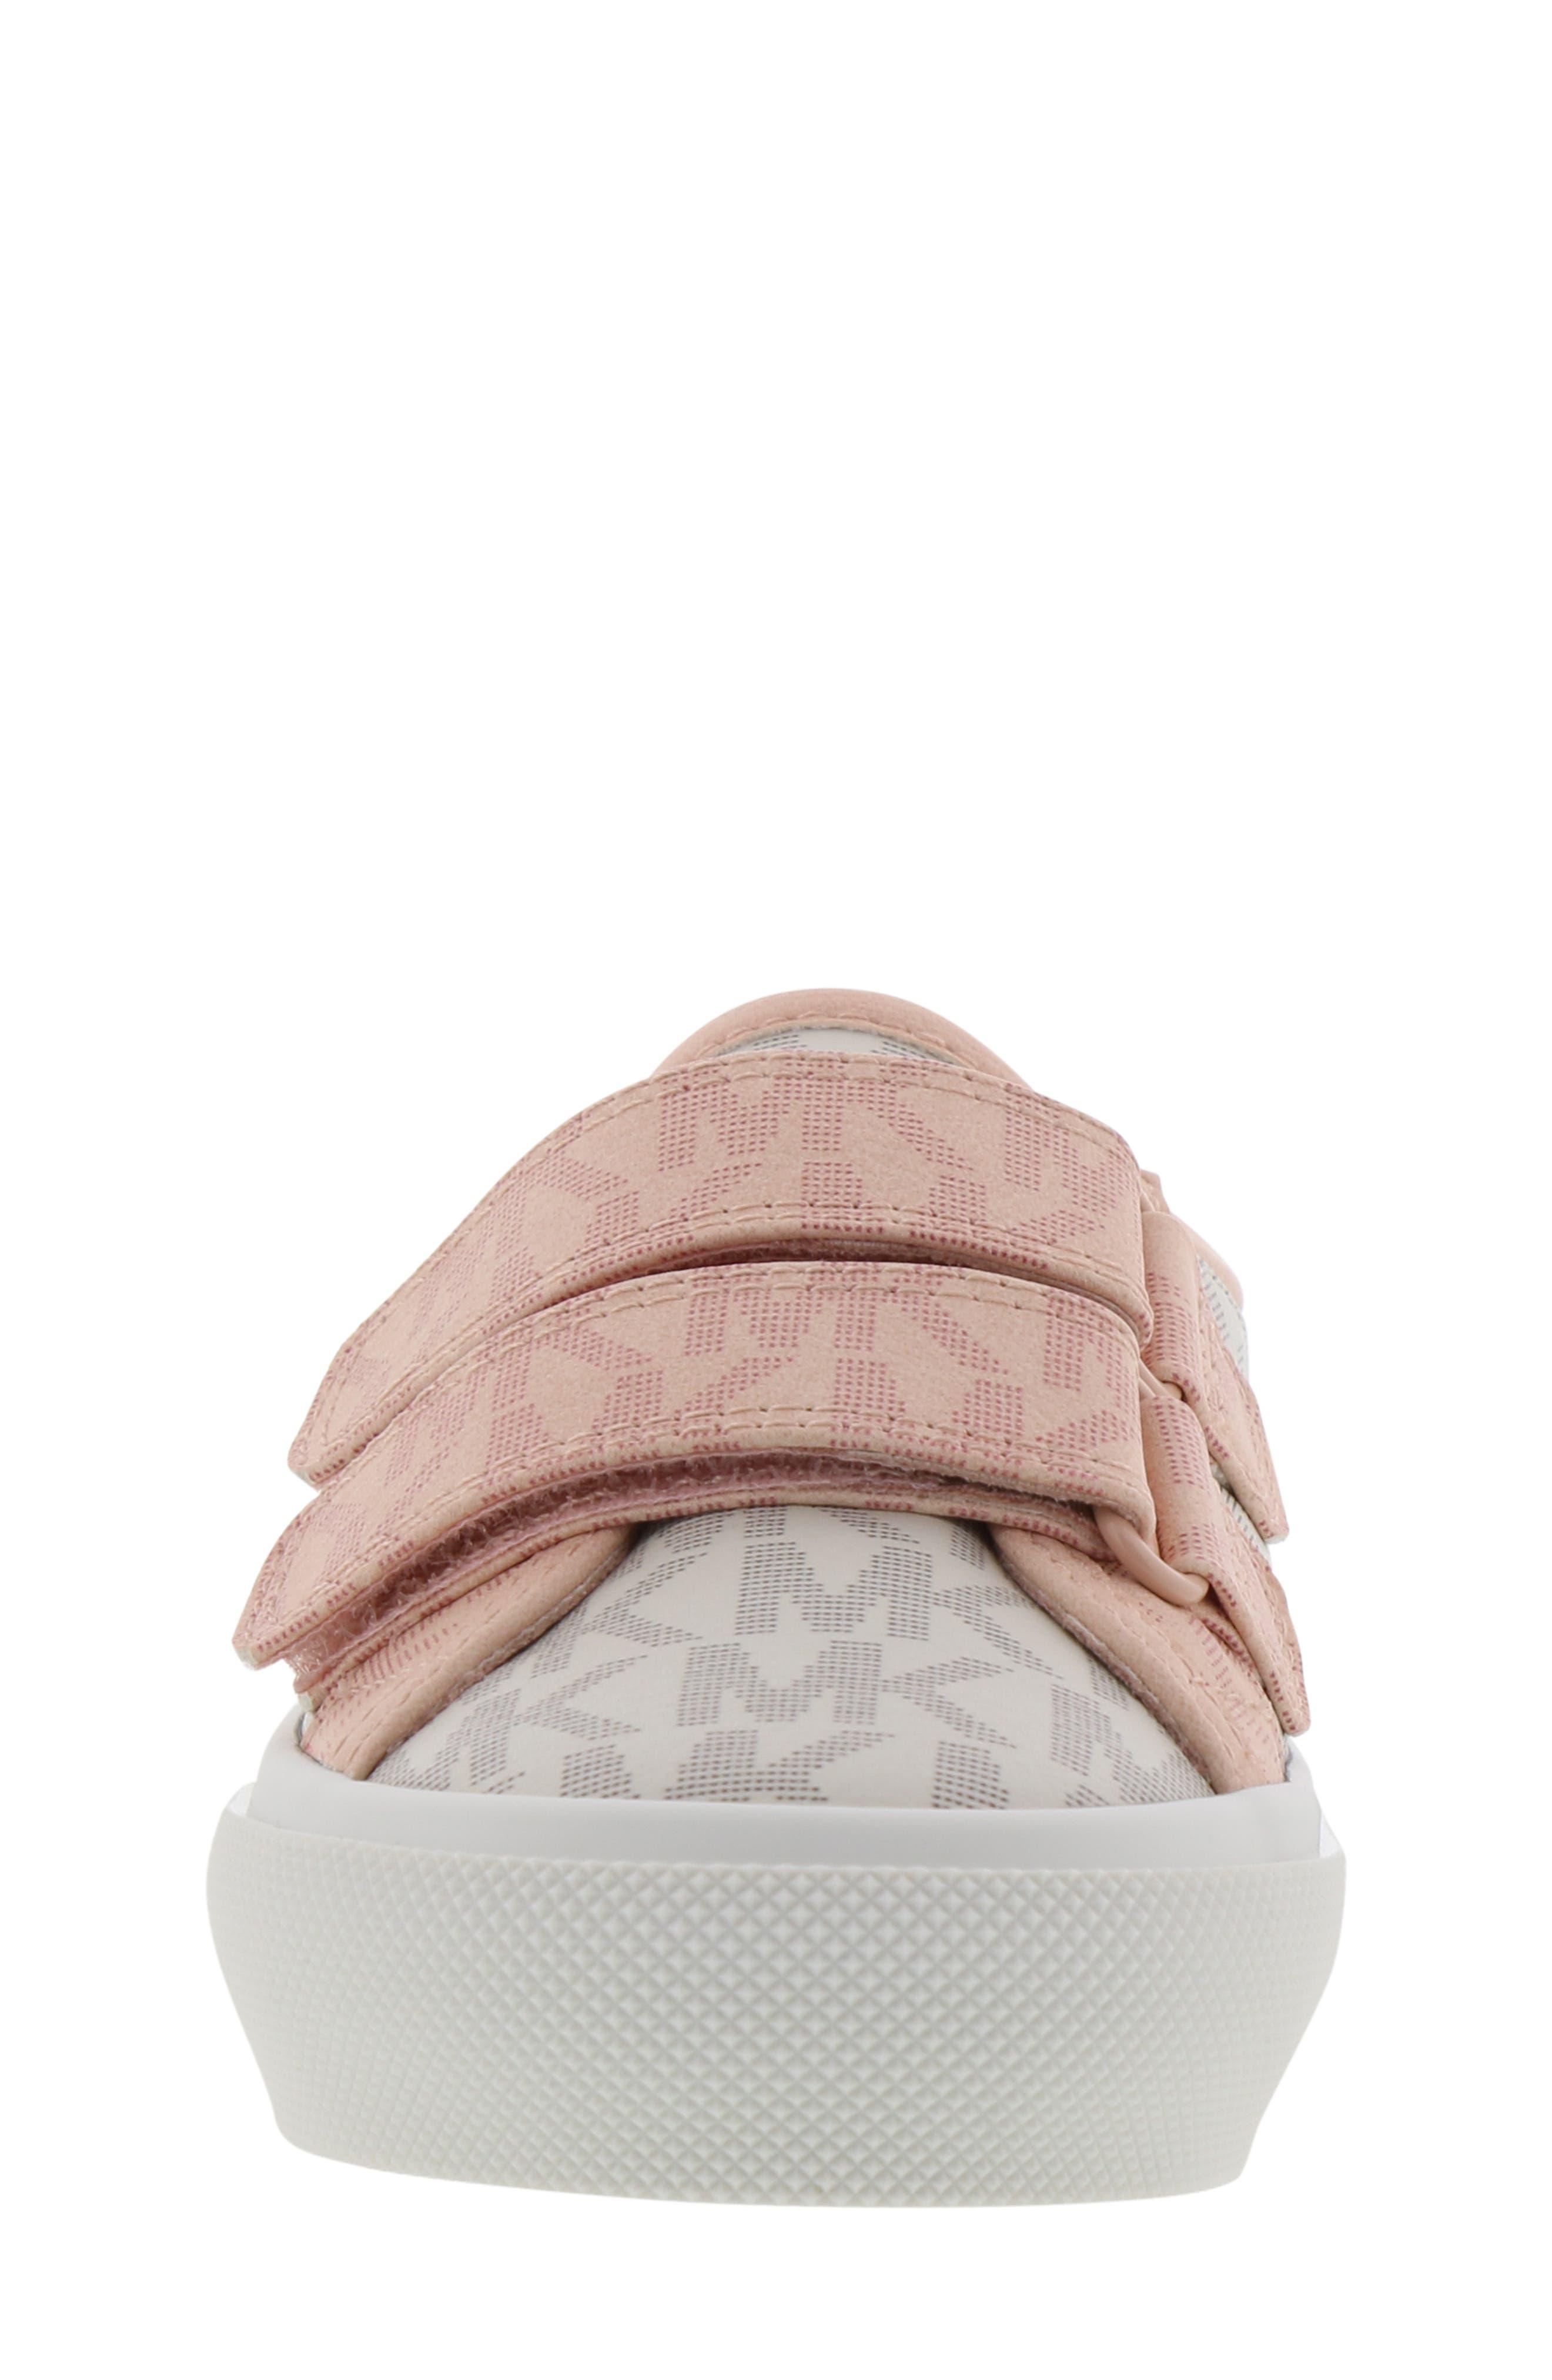 Ima Double Platform Sneaker,                             Alternate thumbnail 4, color,                             VANILLA/ BLUSH